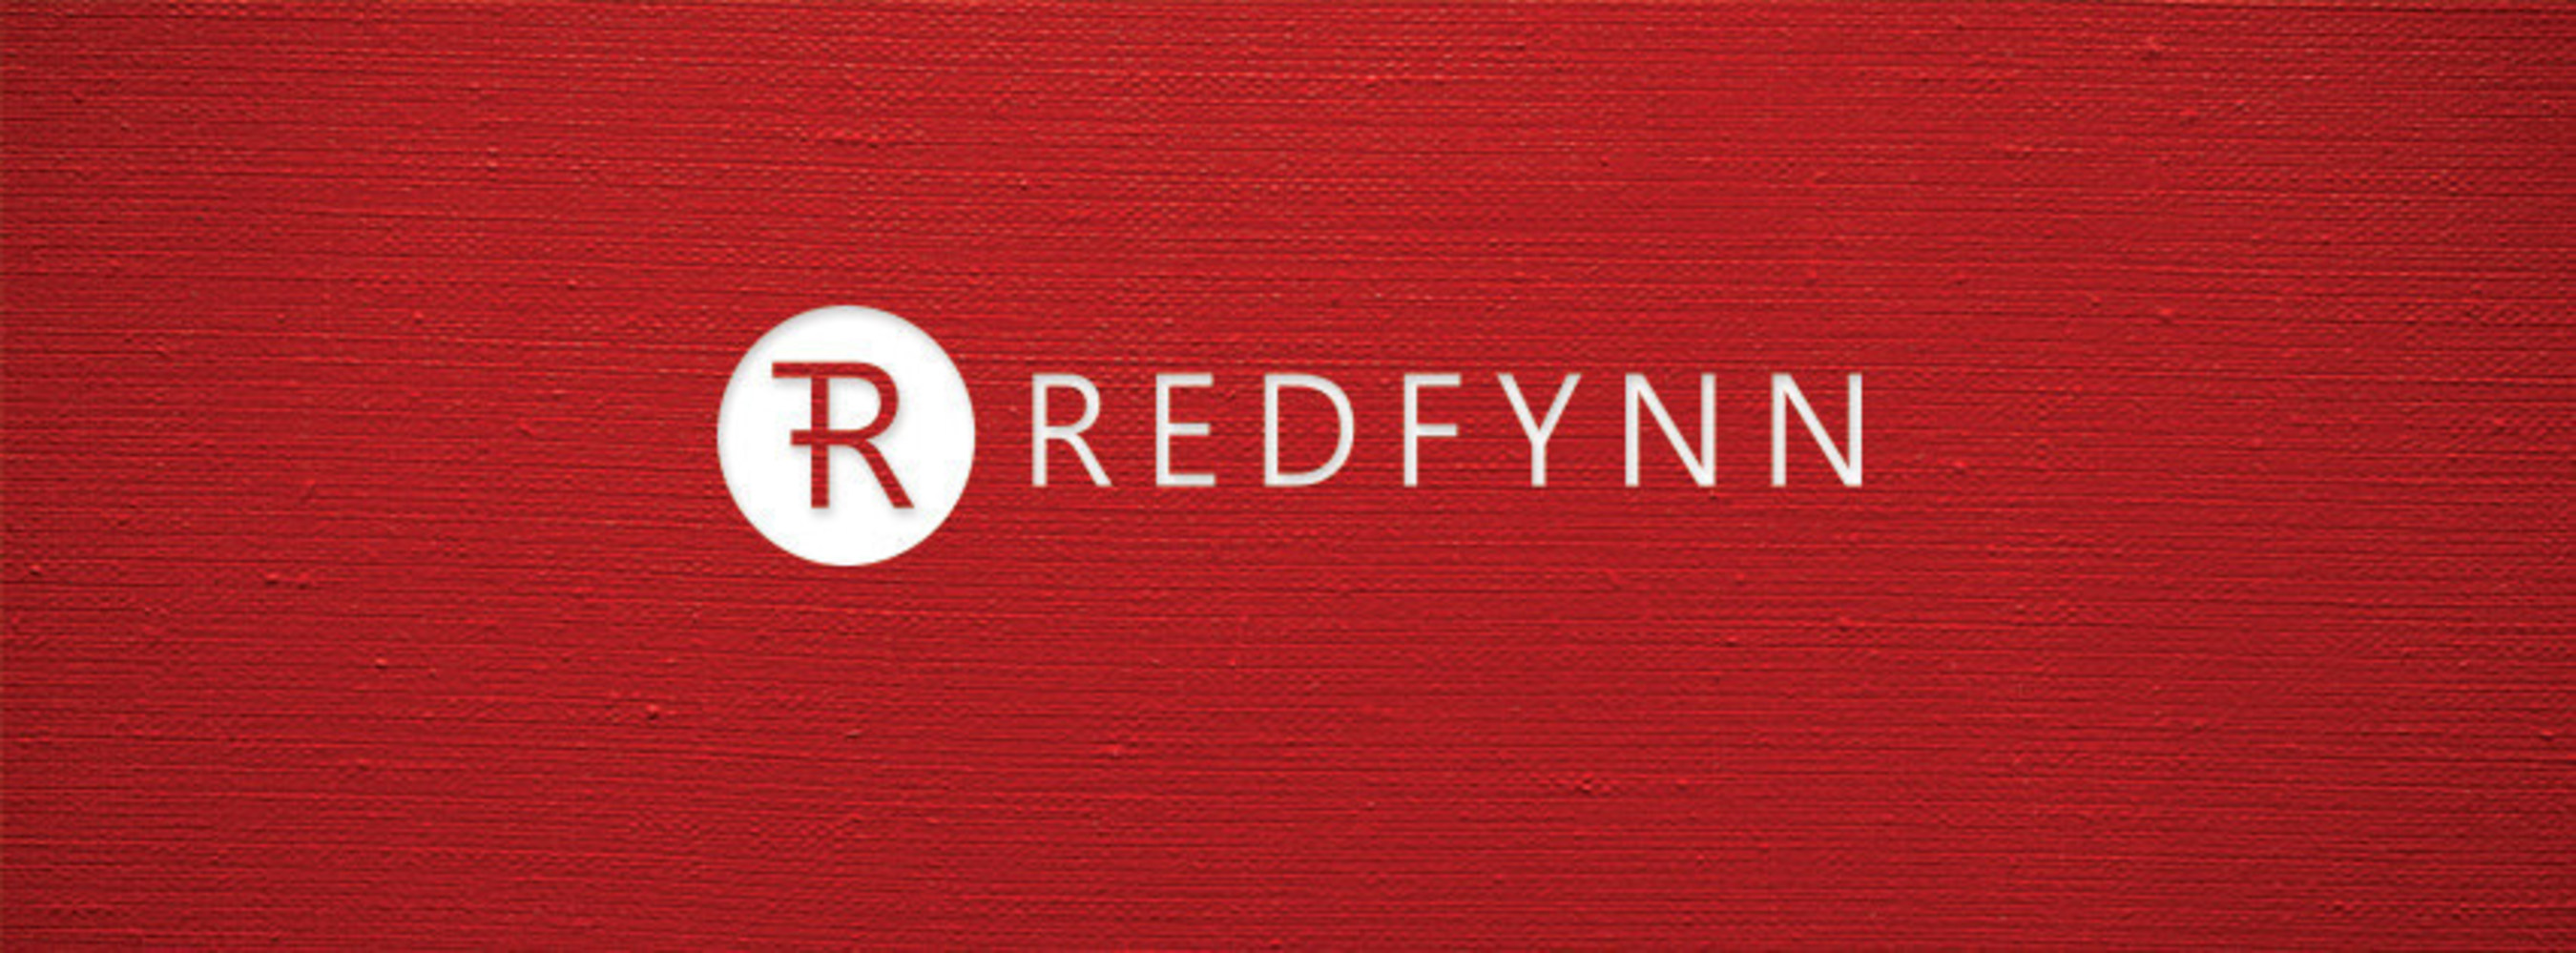 RedFynn Technologies announces #redfynnefficiencyhacks campaign using Instagram